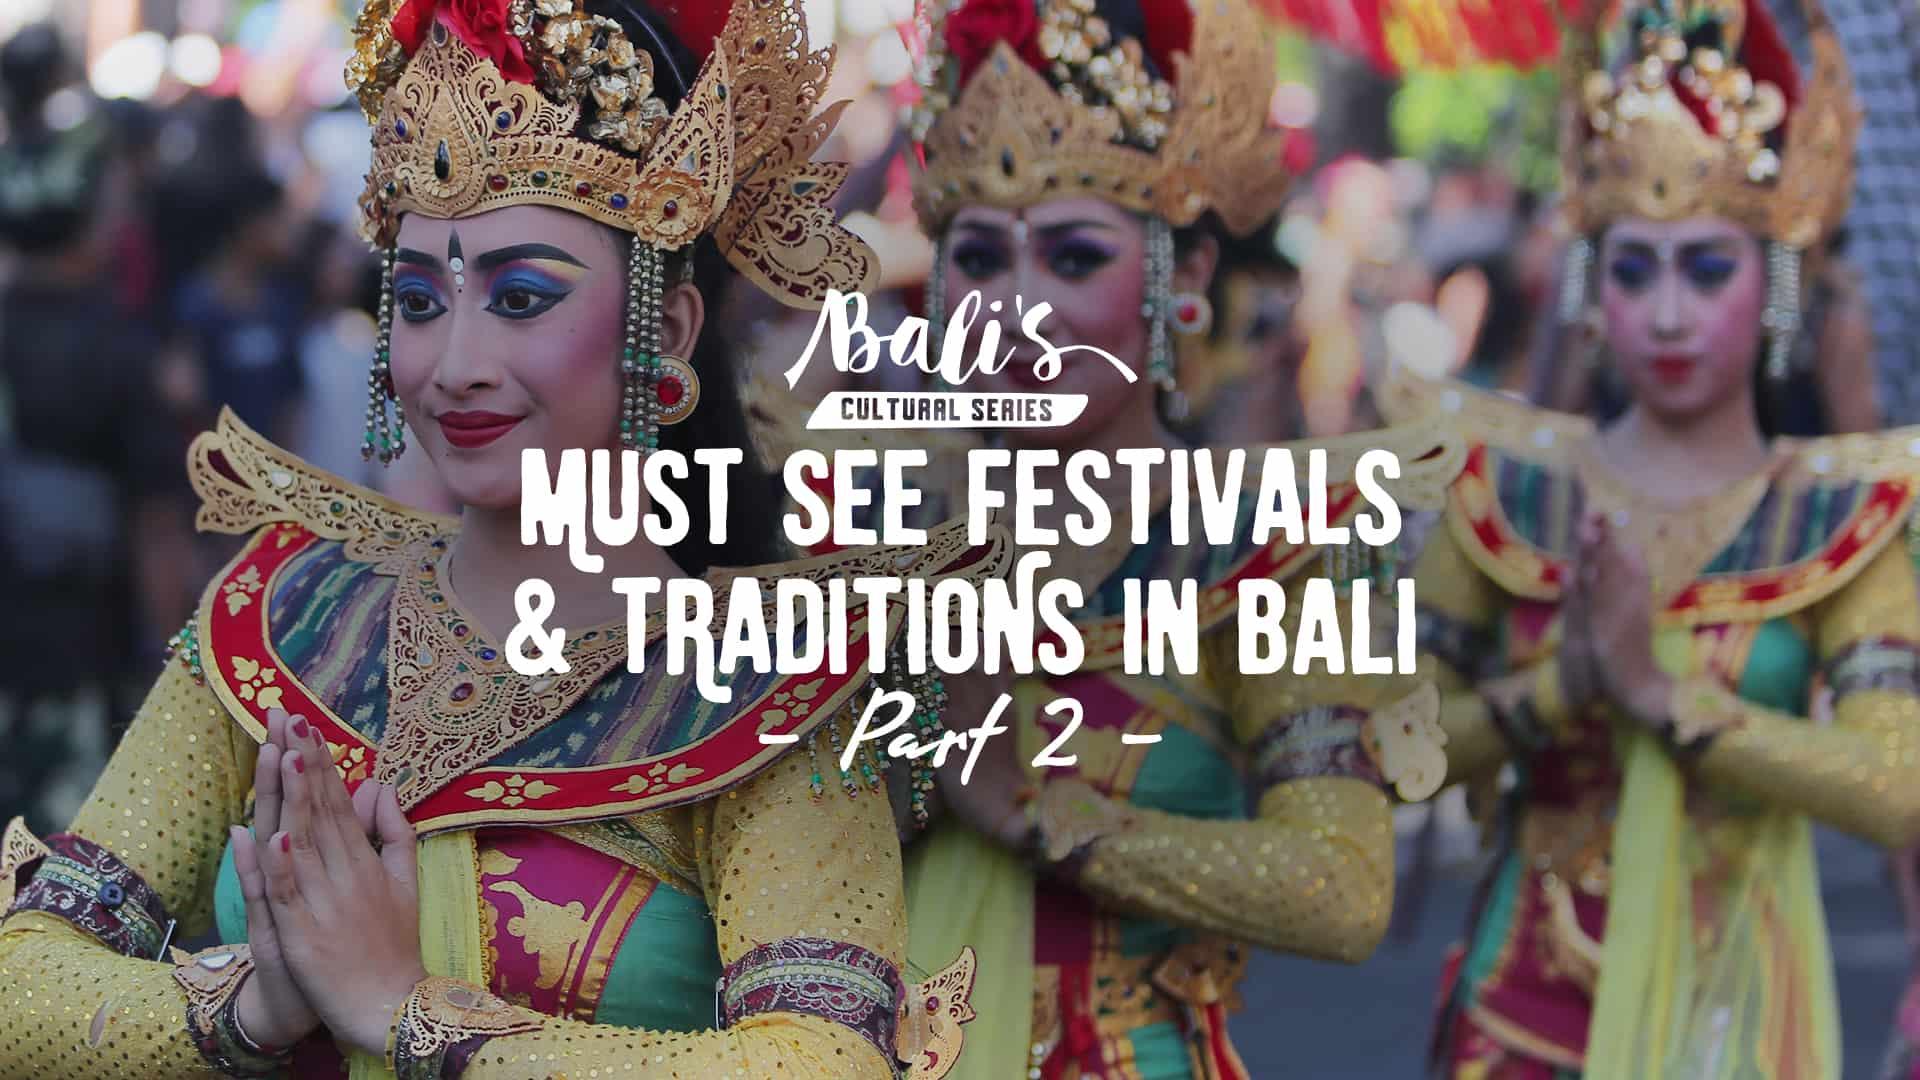 must see traditional dan festival in bali